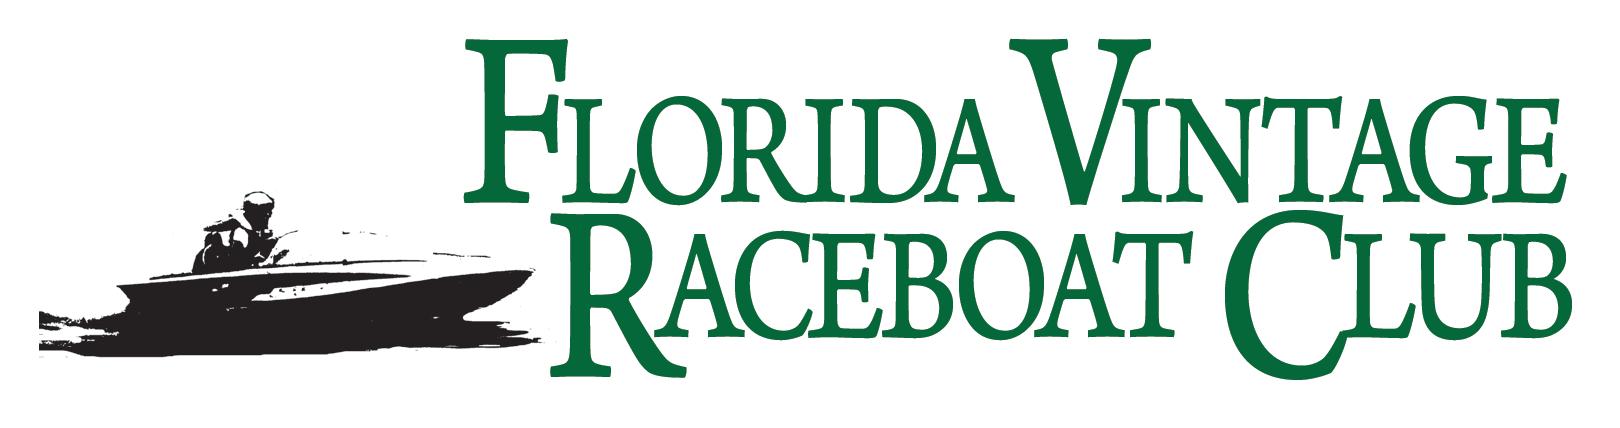 Florida Vintage Raceboat Club